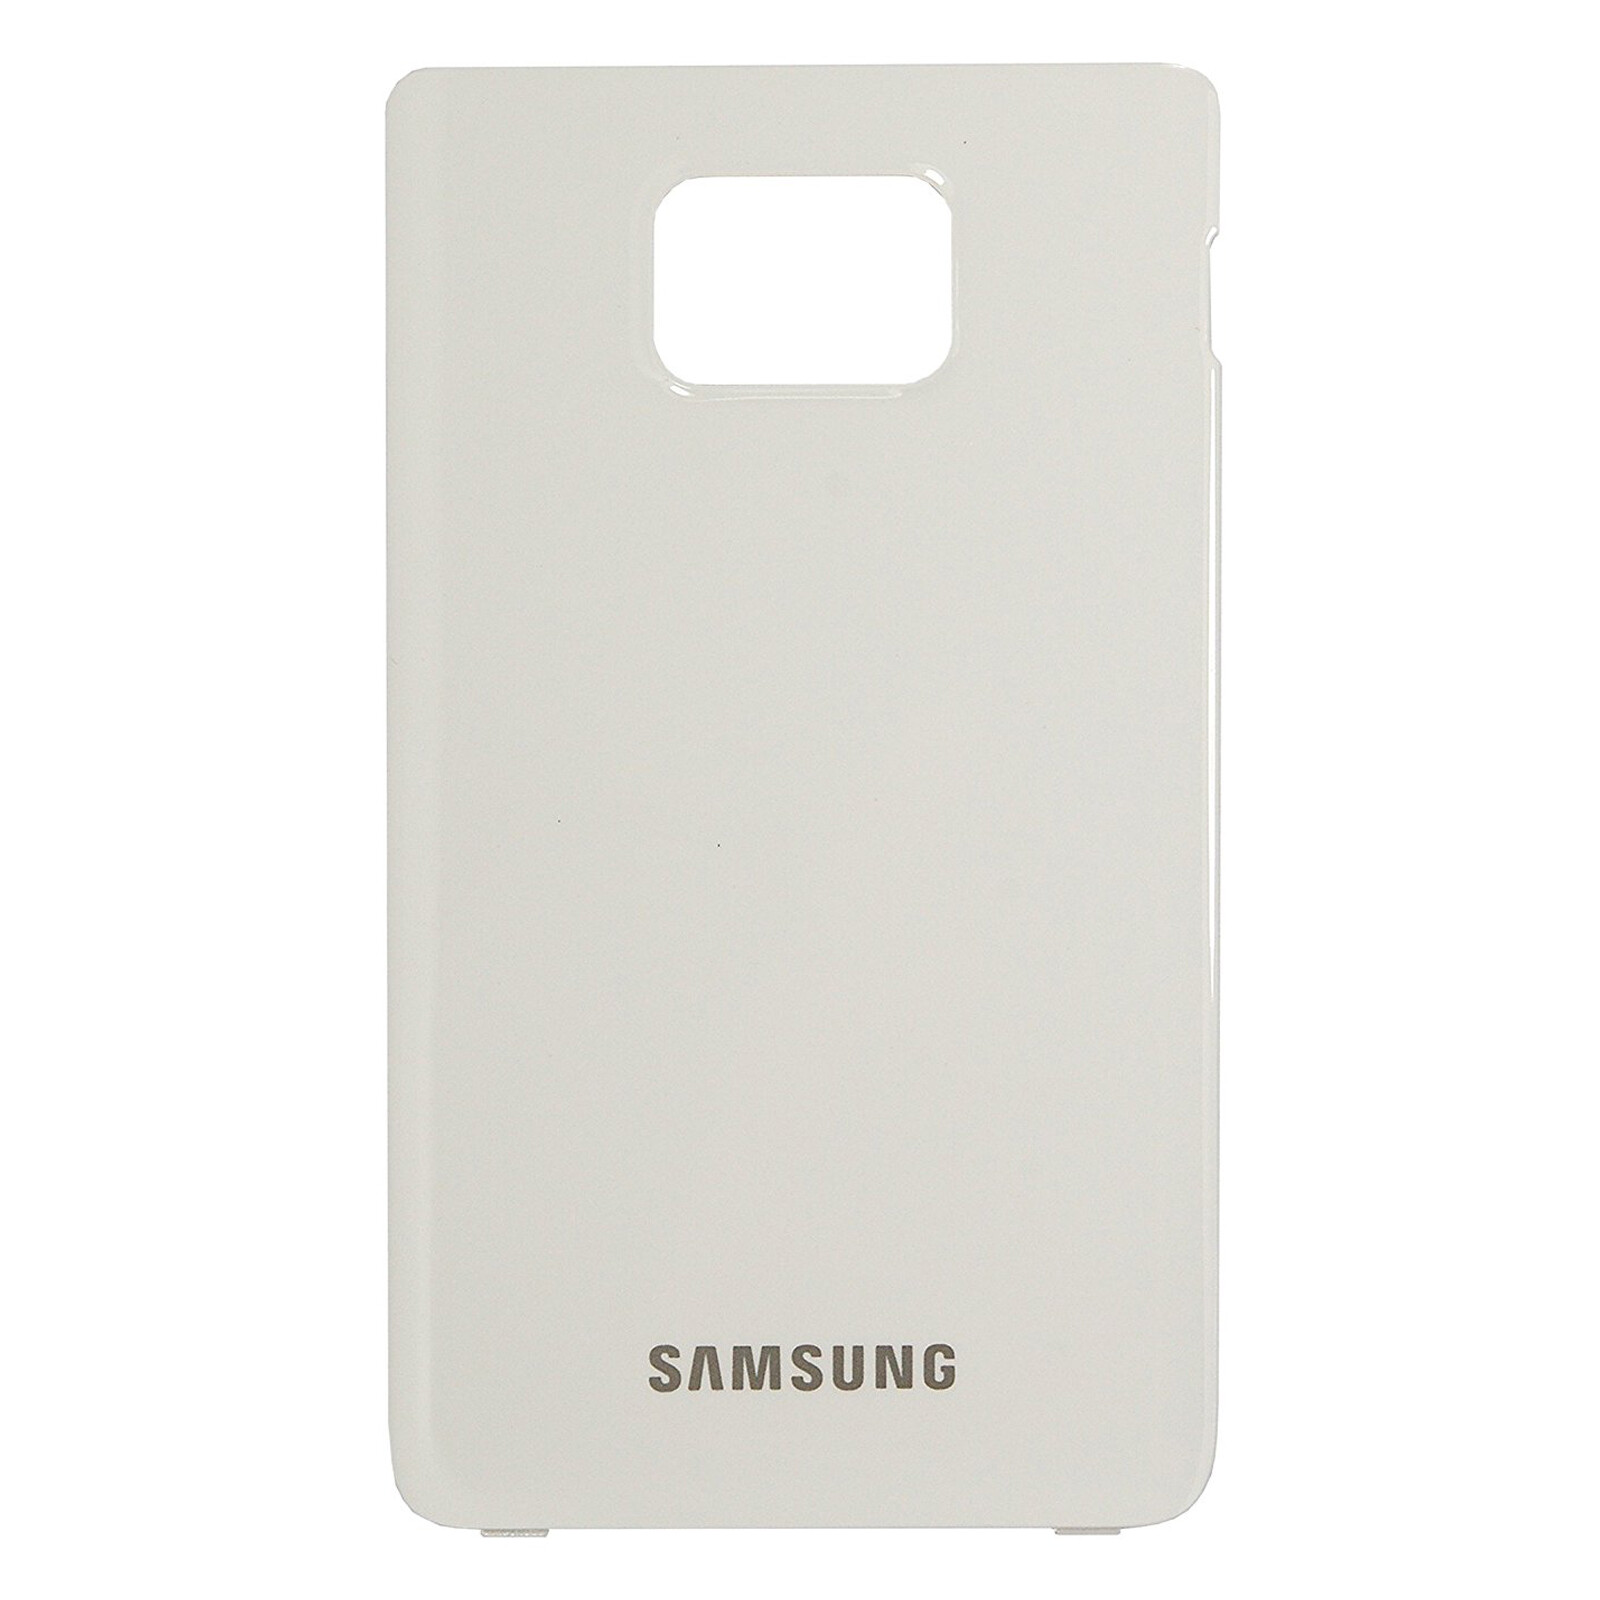 Samsung Original Akkufachdeckel Galaxy S2